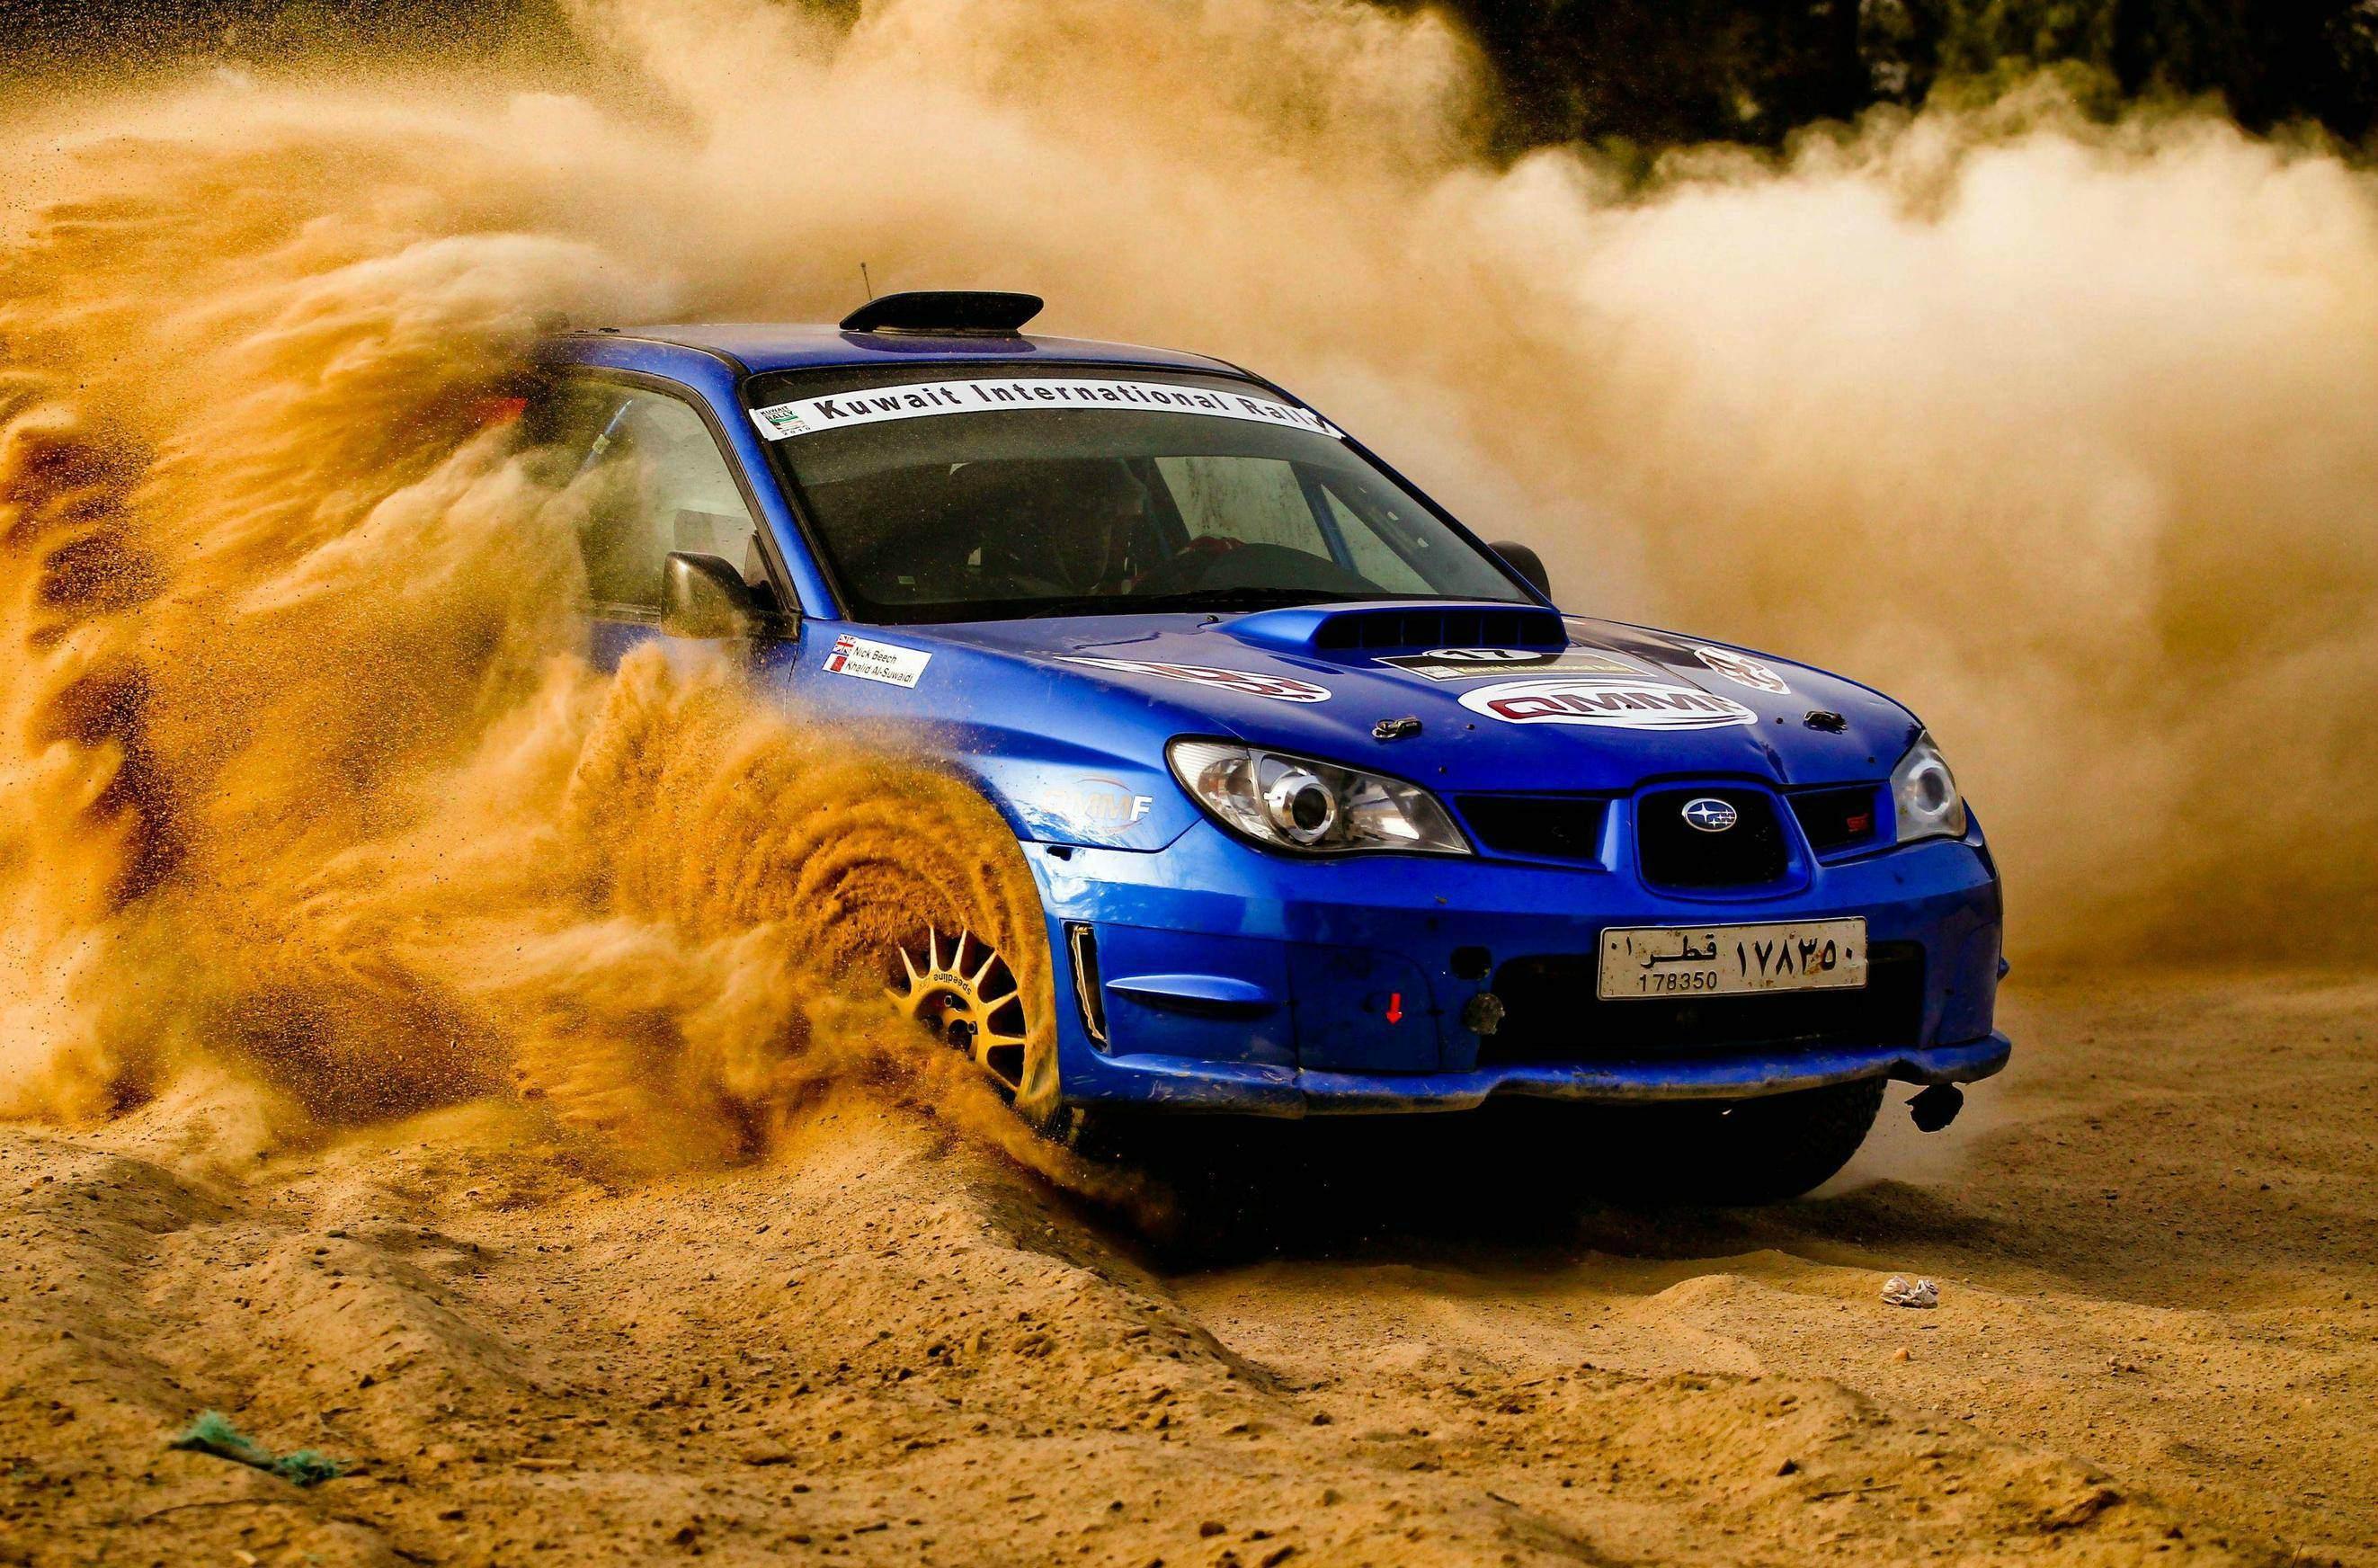 General 2645x1744 car Subaru Subaru Impreza WRX STi dirt vehicle blue cars numbers rally cars Rally racing sport